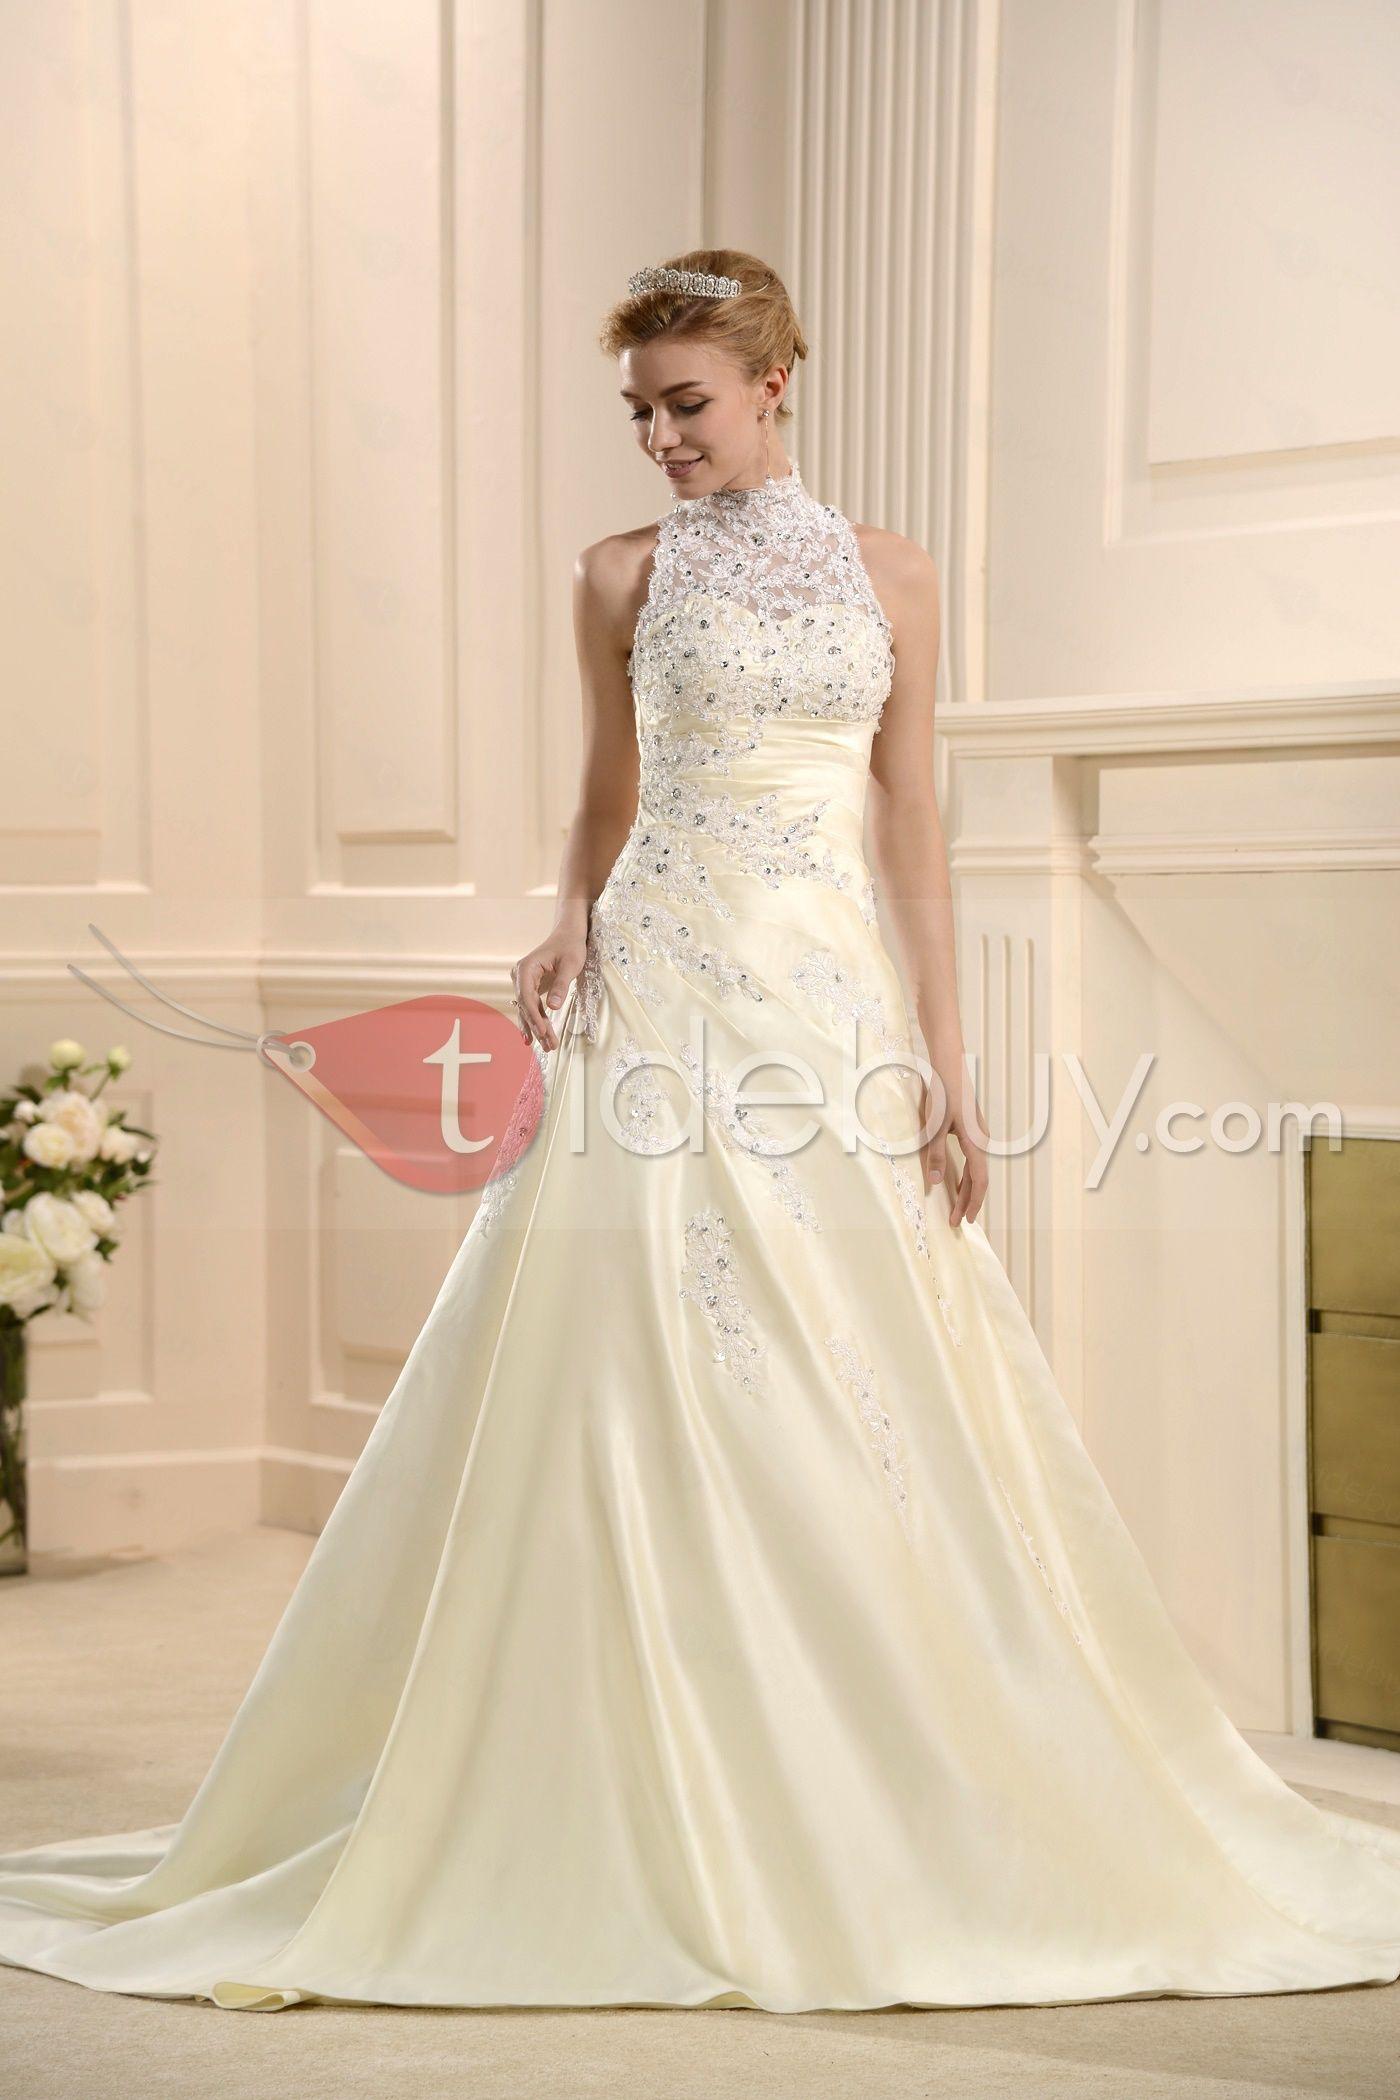 Modest wedding dresses under 200  Aラインハイネックチャペル床長さアップリケウェディングドレス